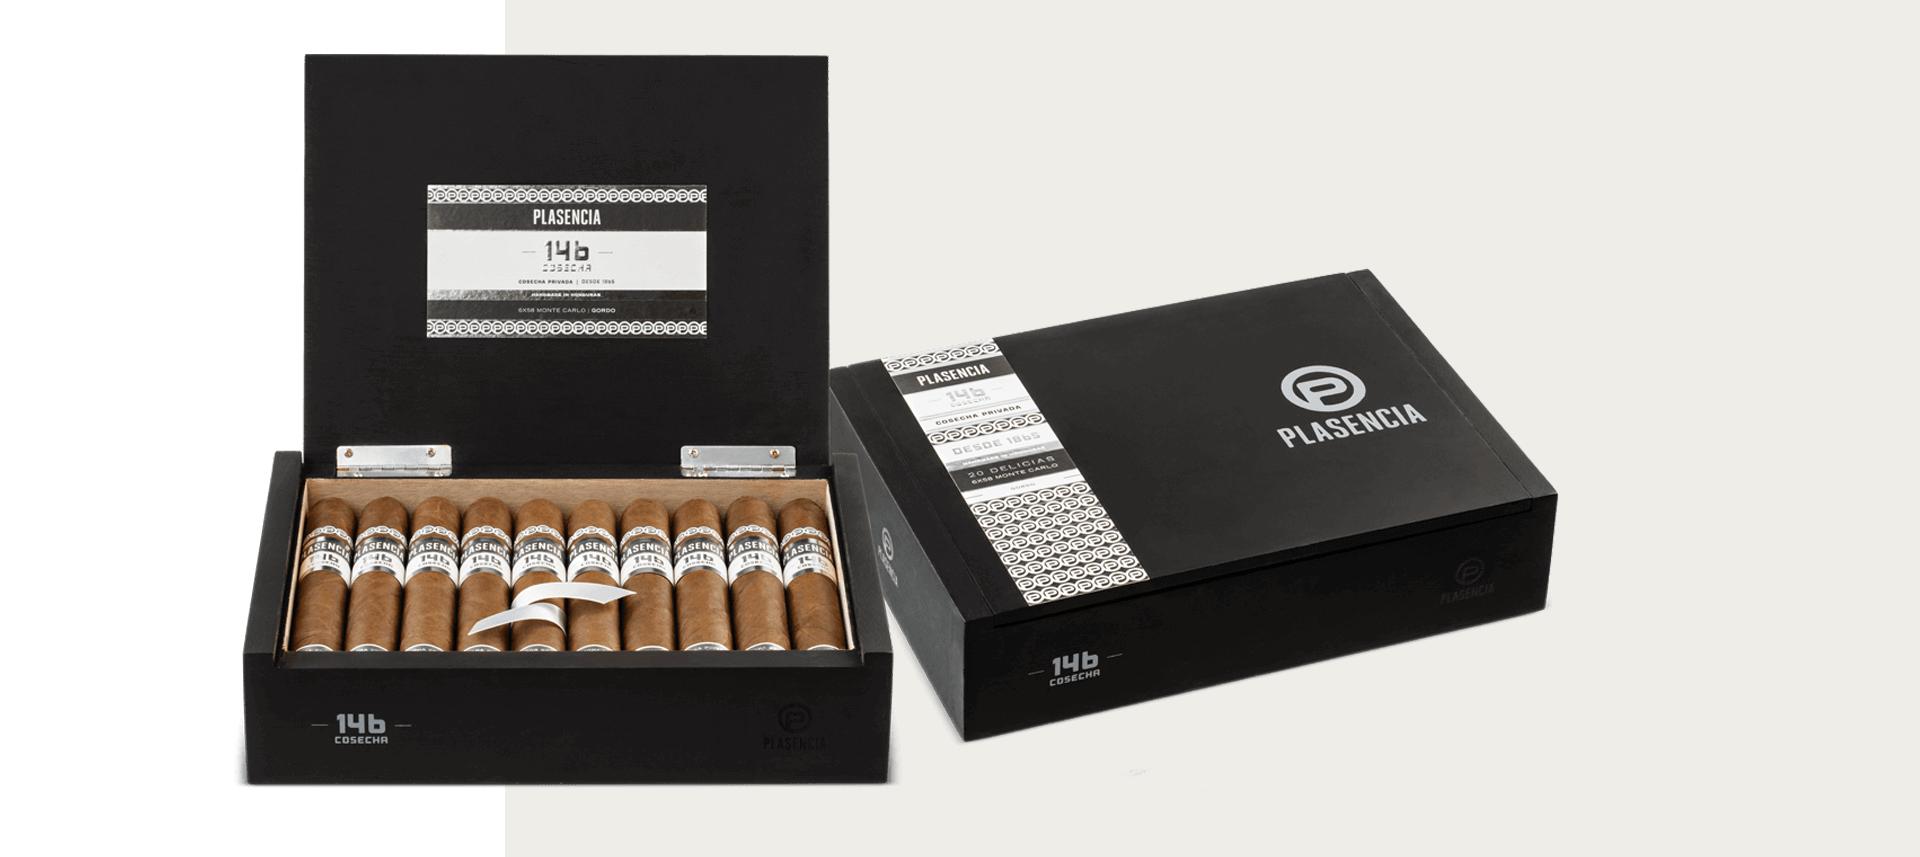 Cosecha 146 Box